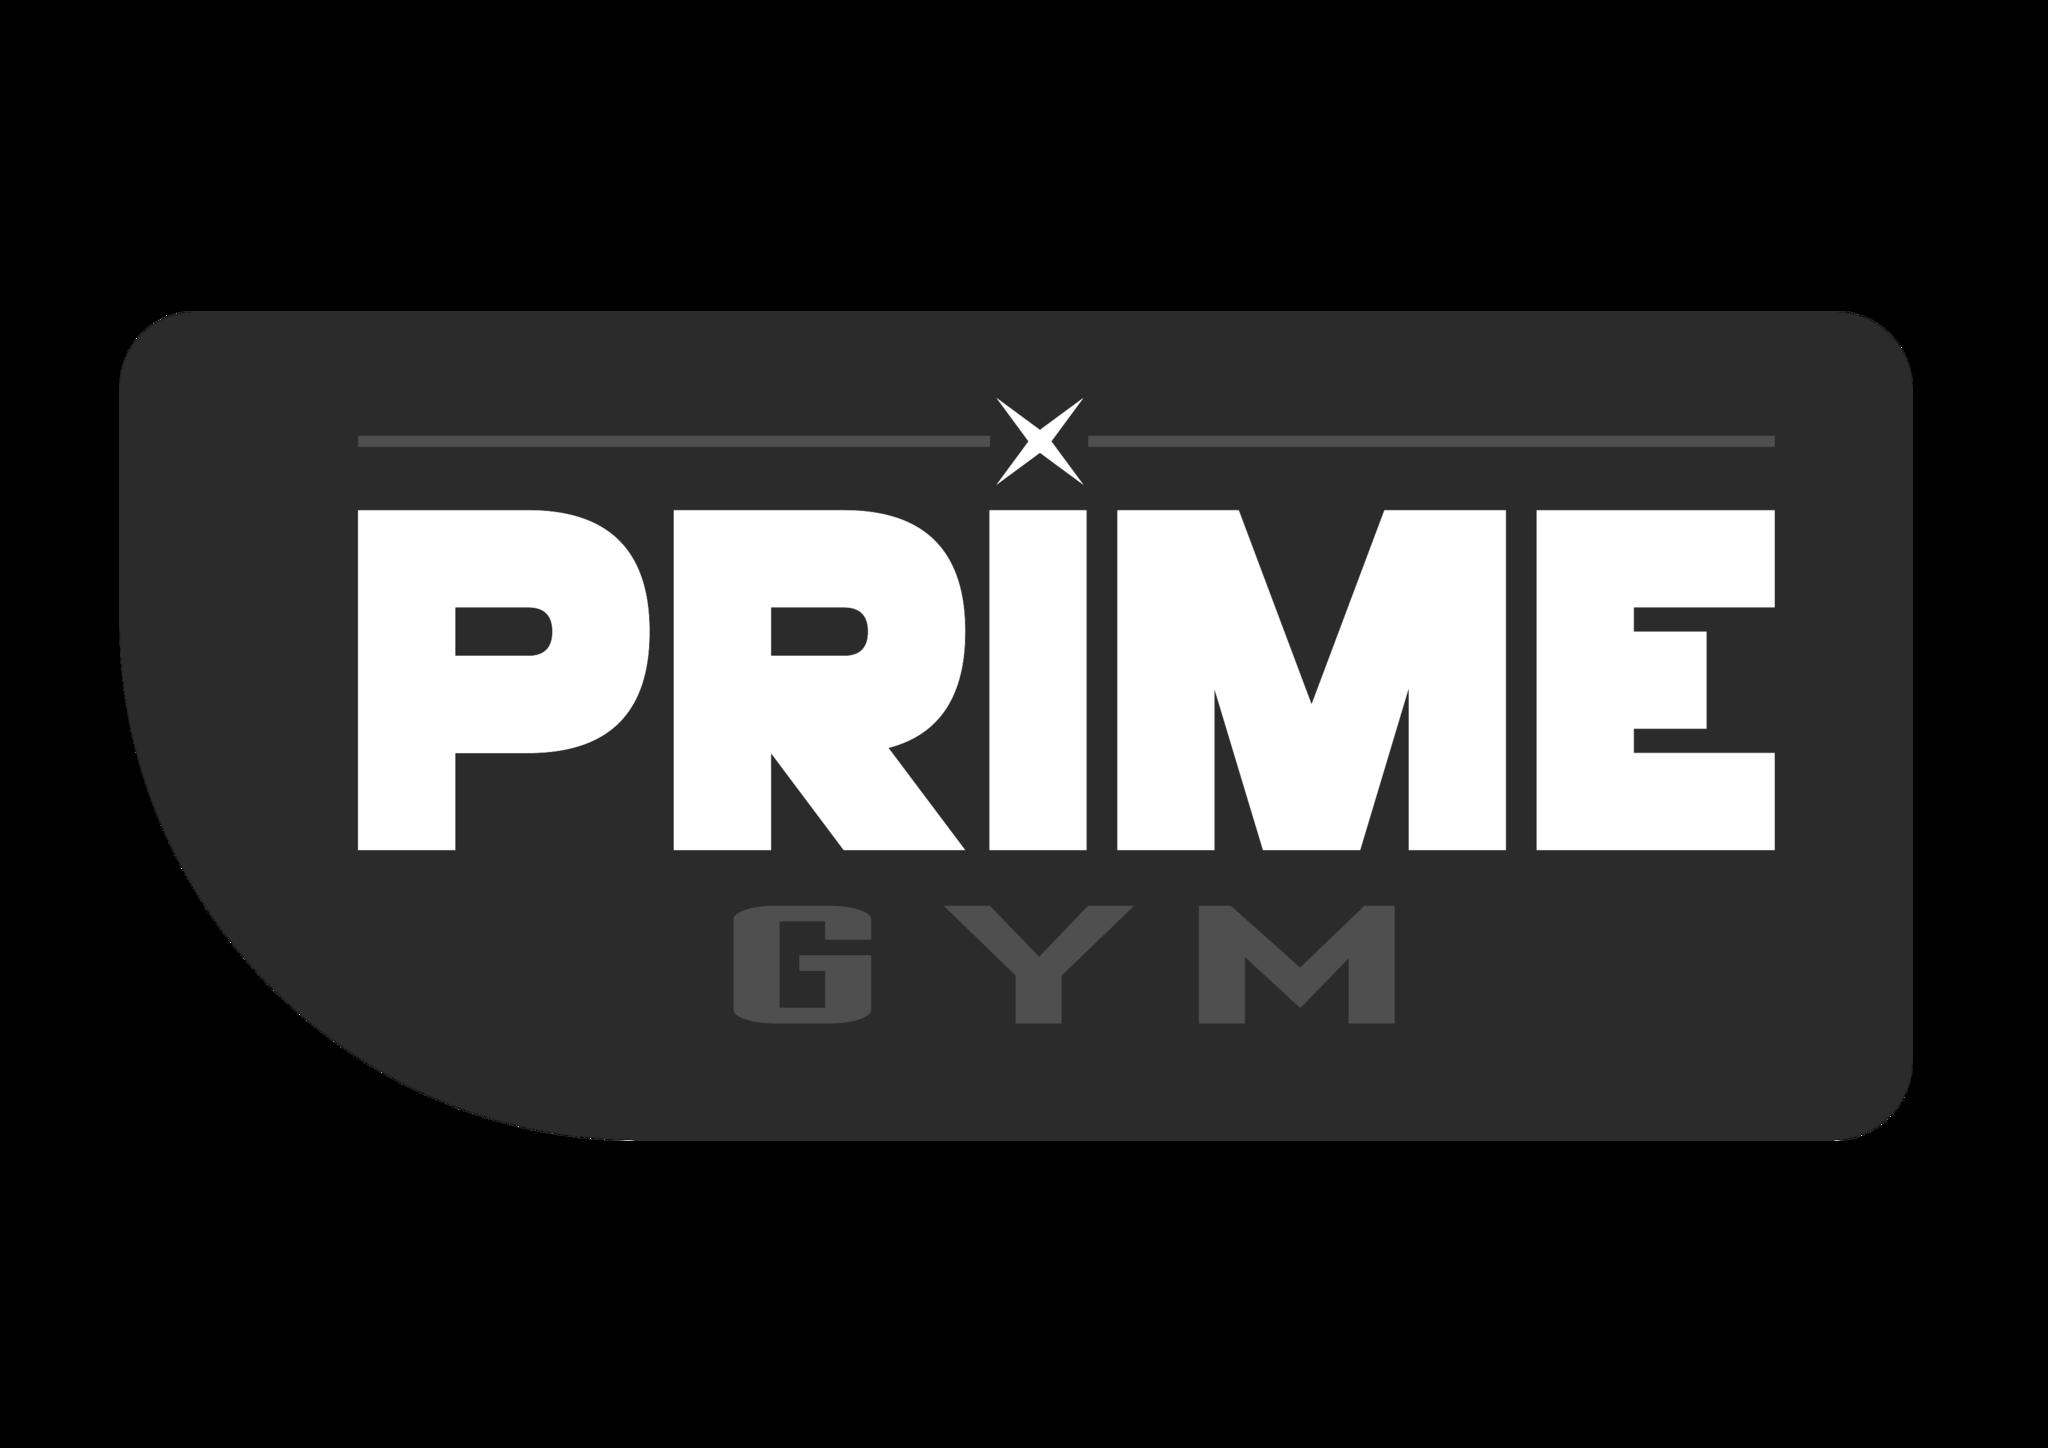 Prime Gym